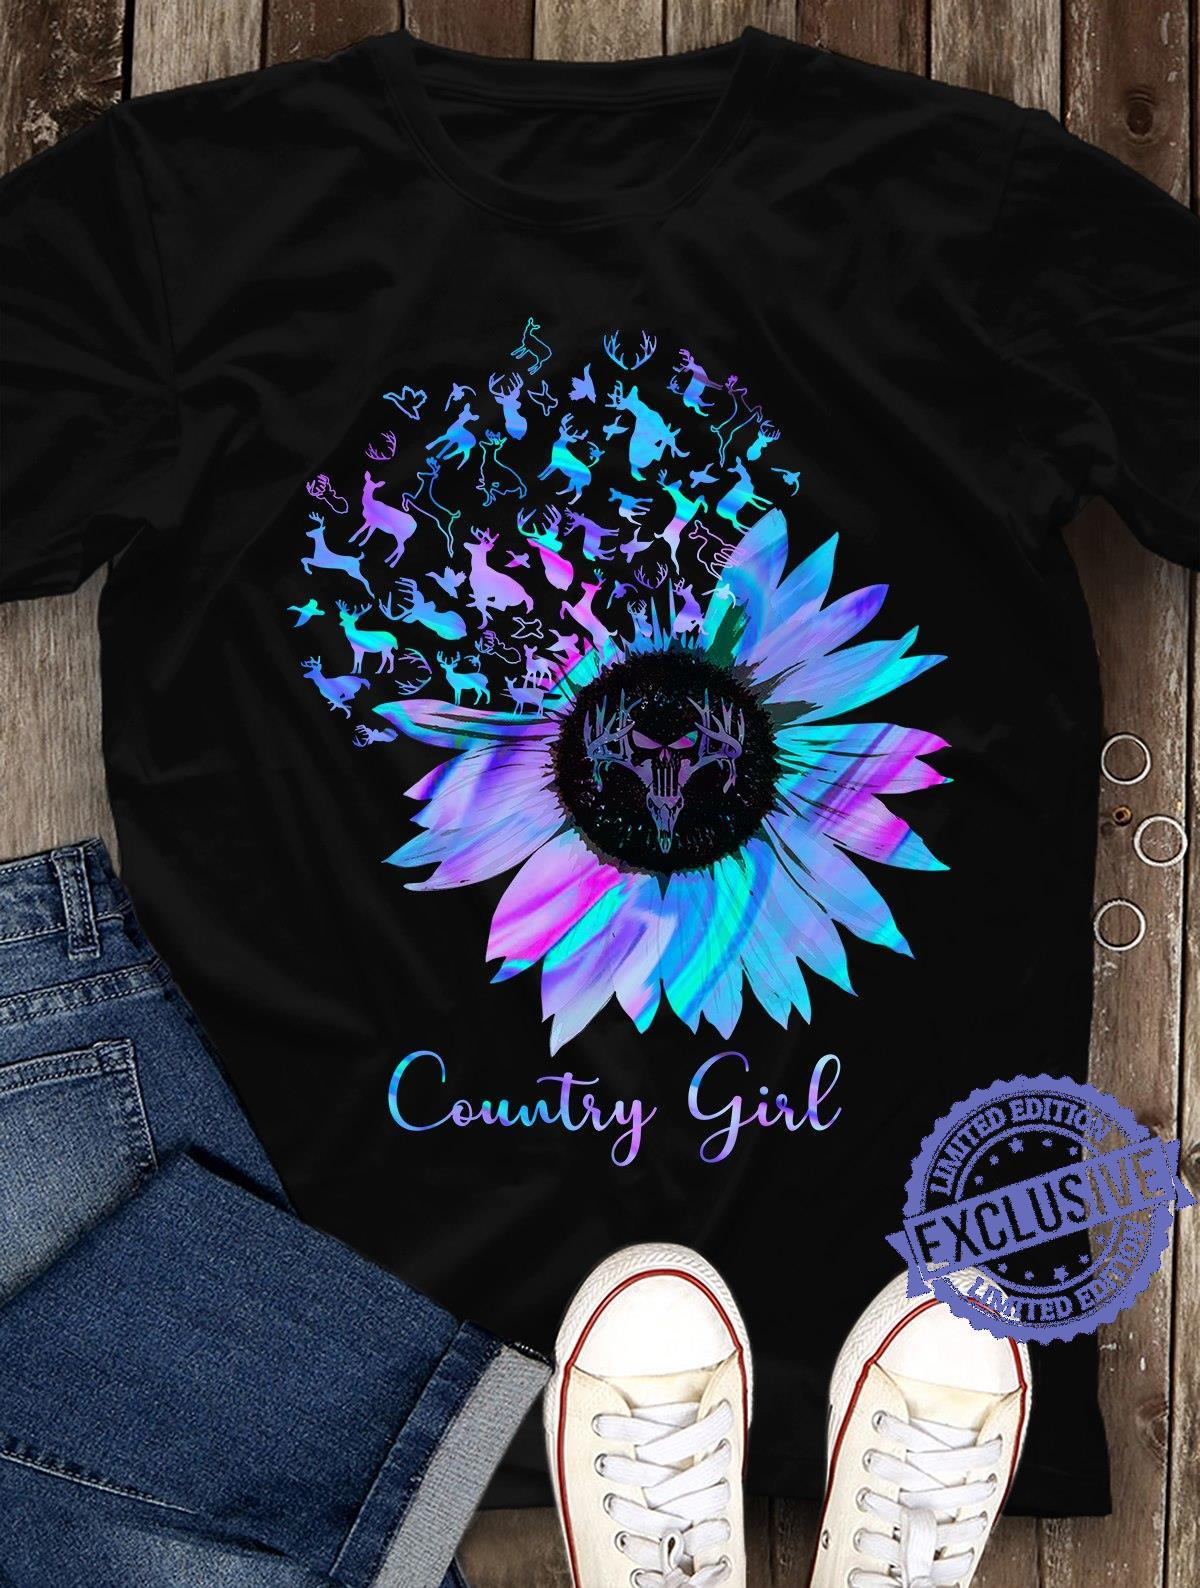 Country girl gift shirt